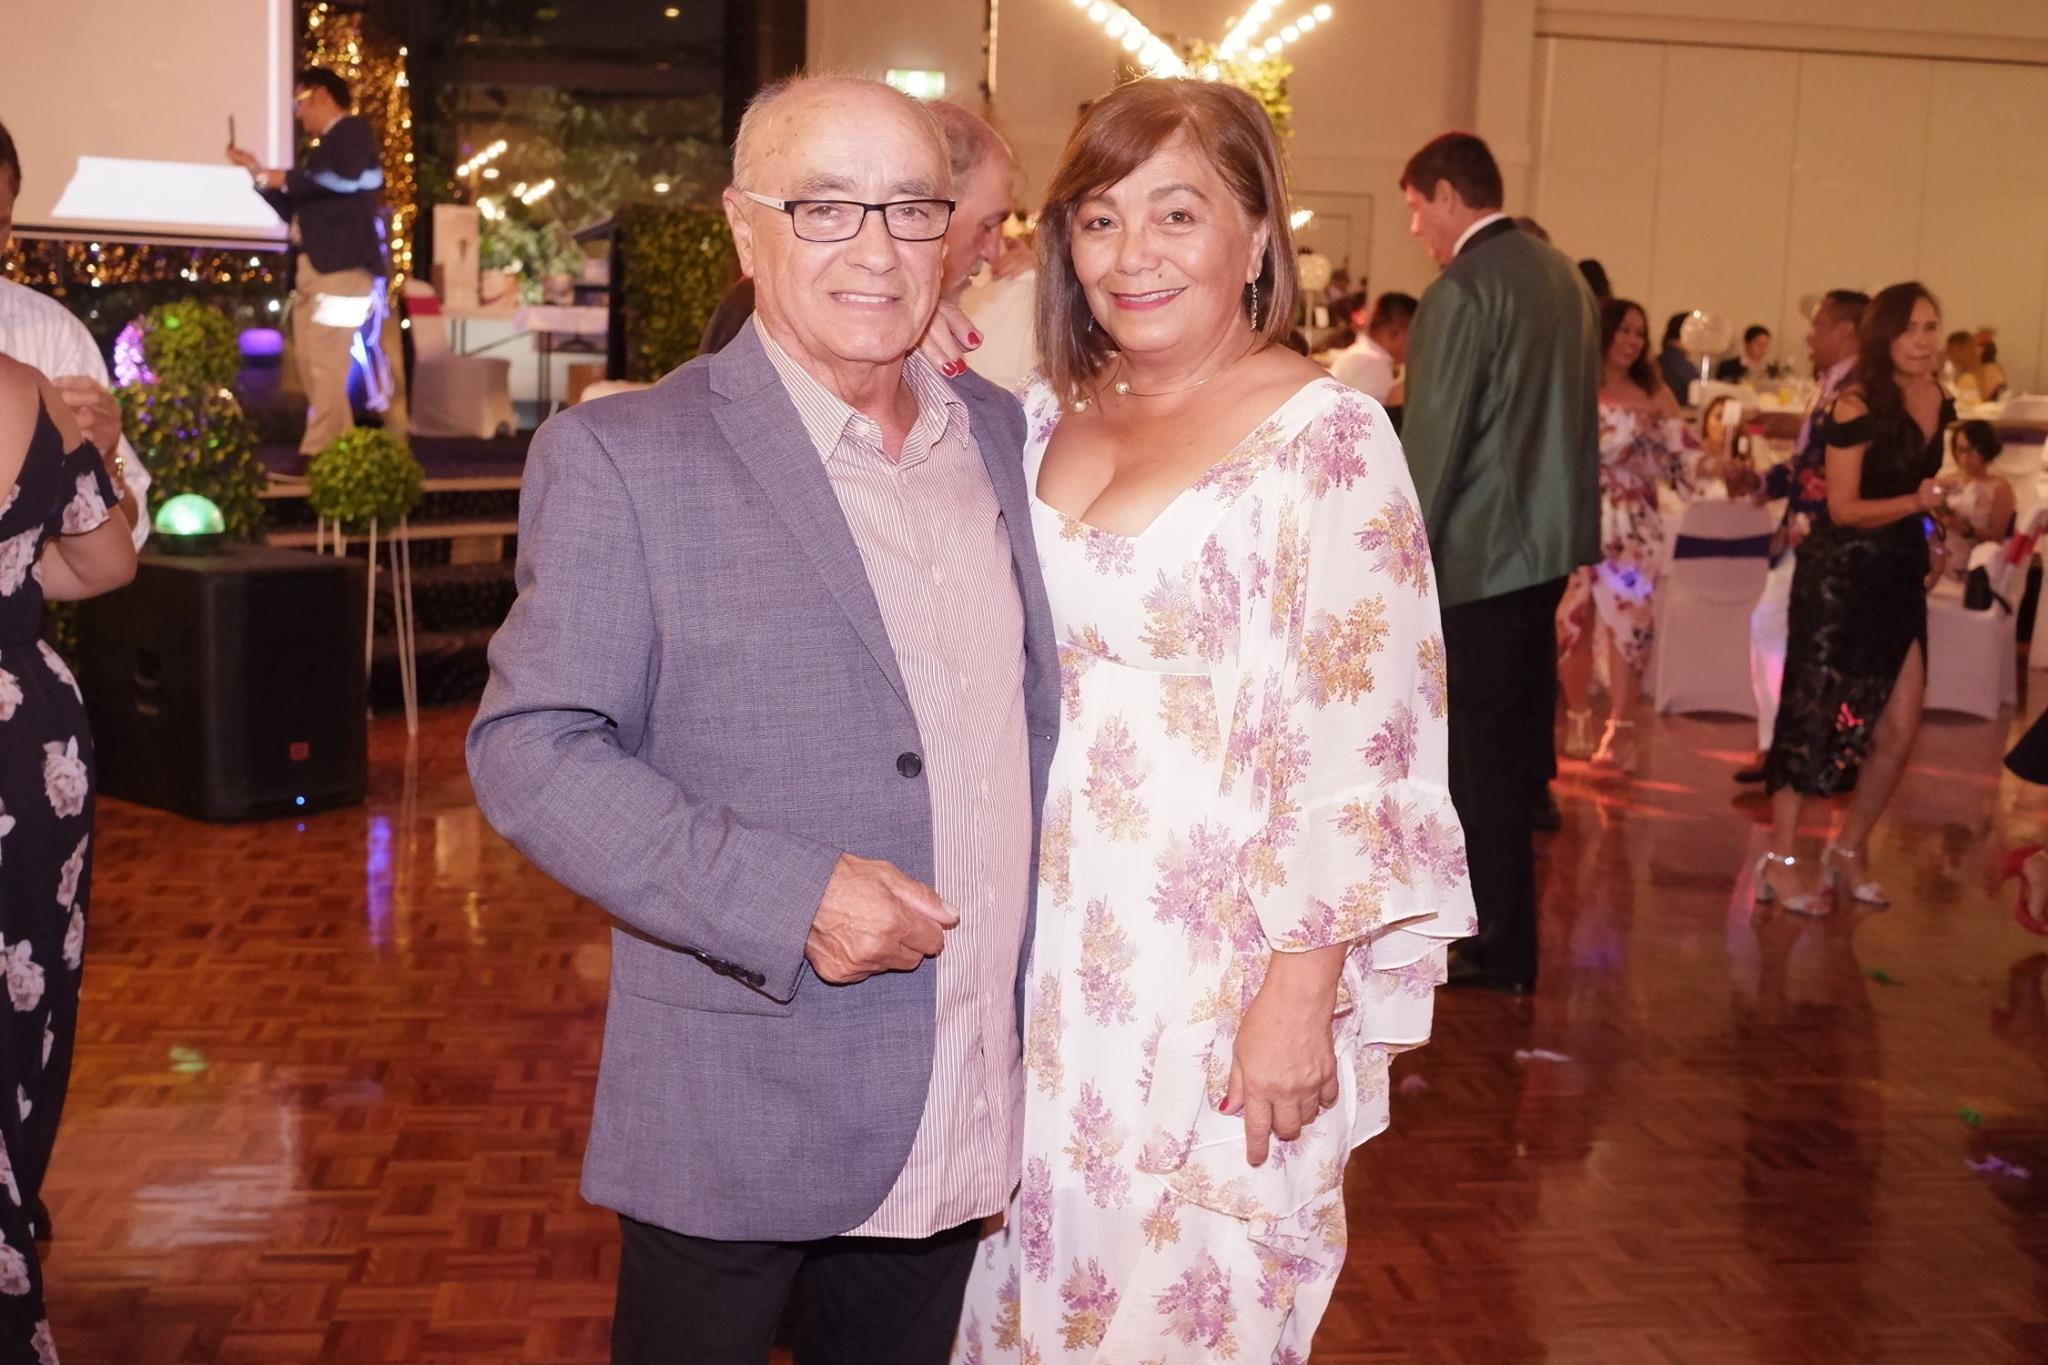 smad-melbourne-charity-philippines-davao-palawan-rio-2019-dinner-dance-melbourne-australia-chrity-ball.jpg